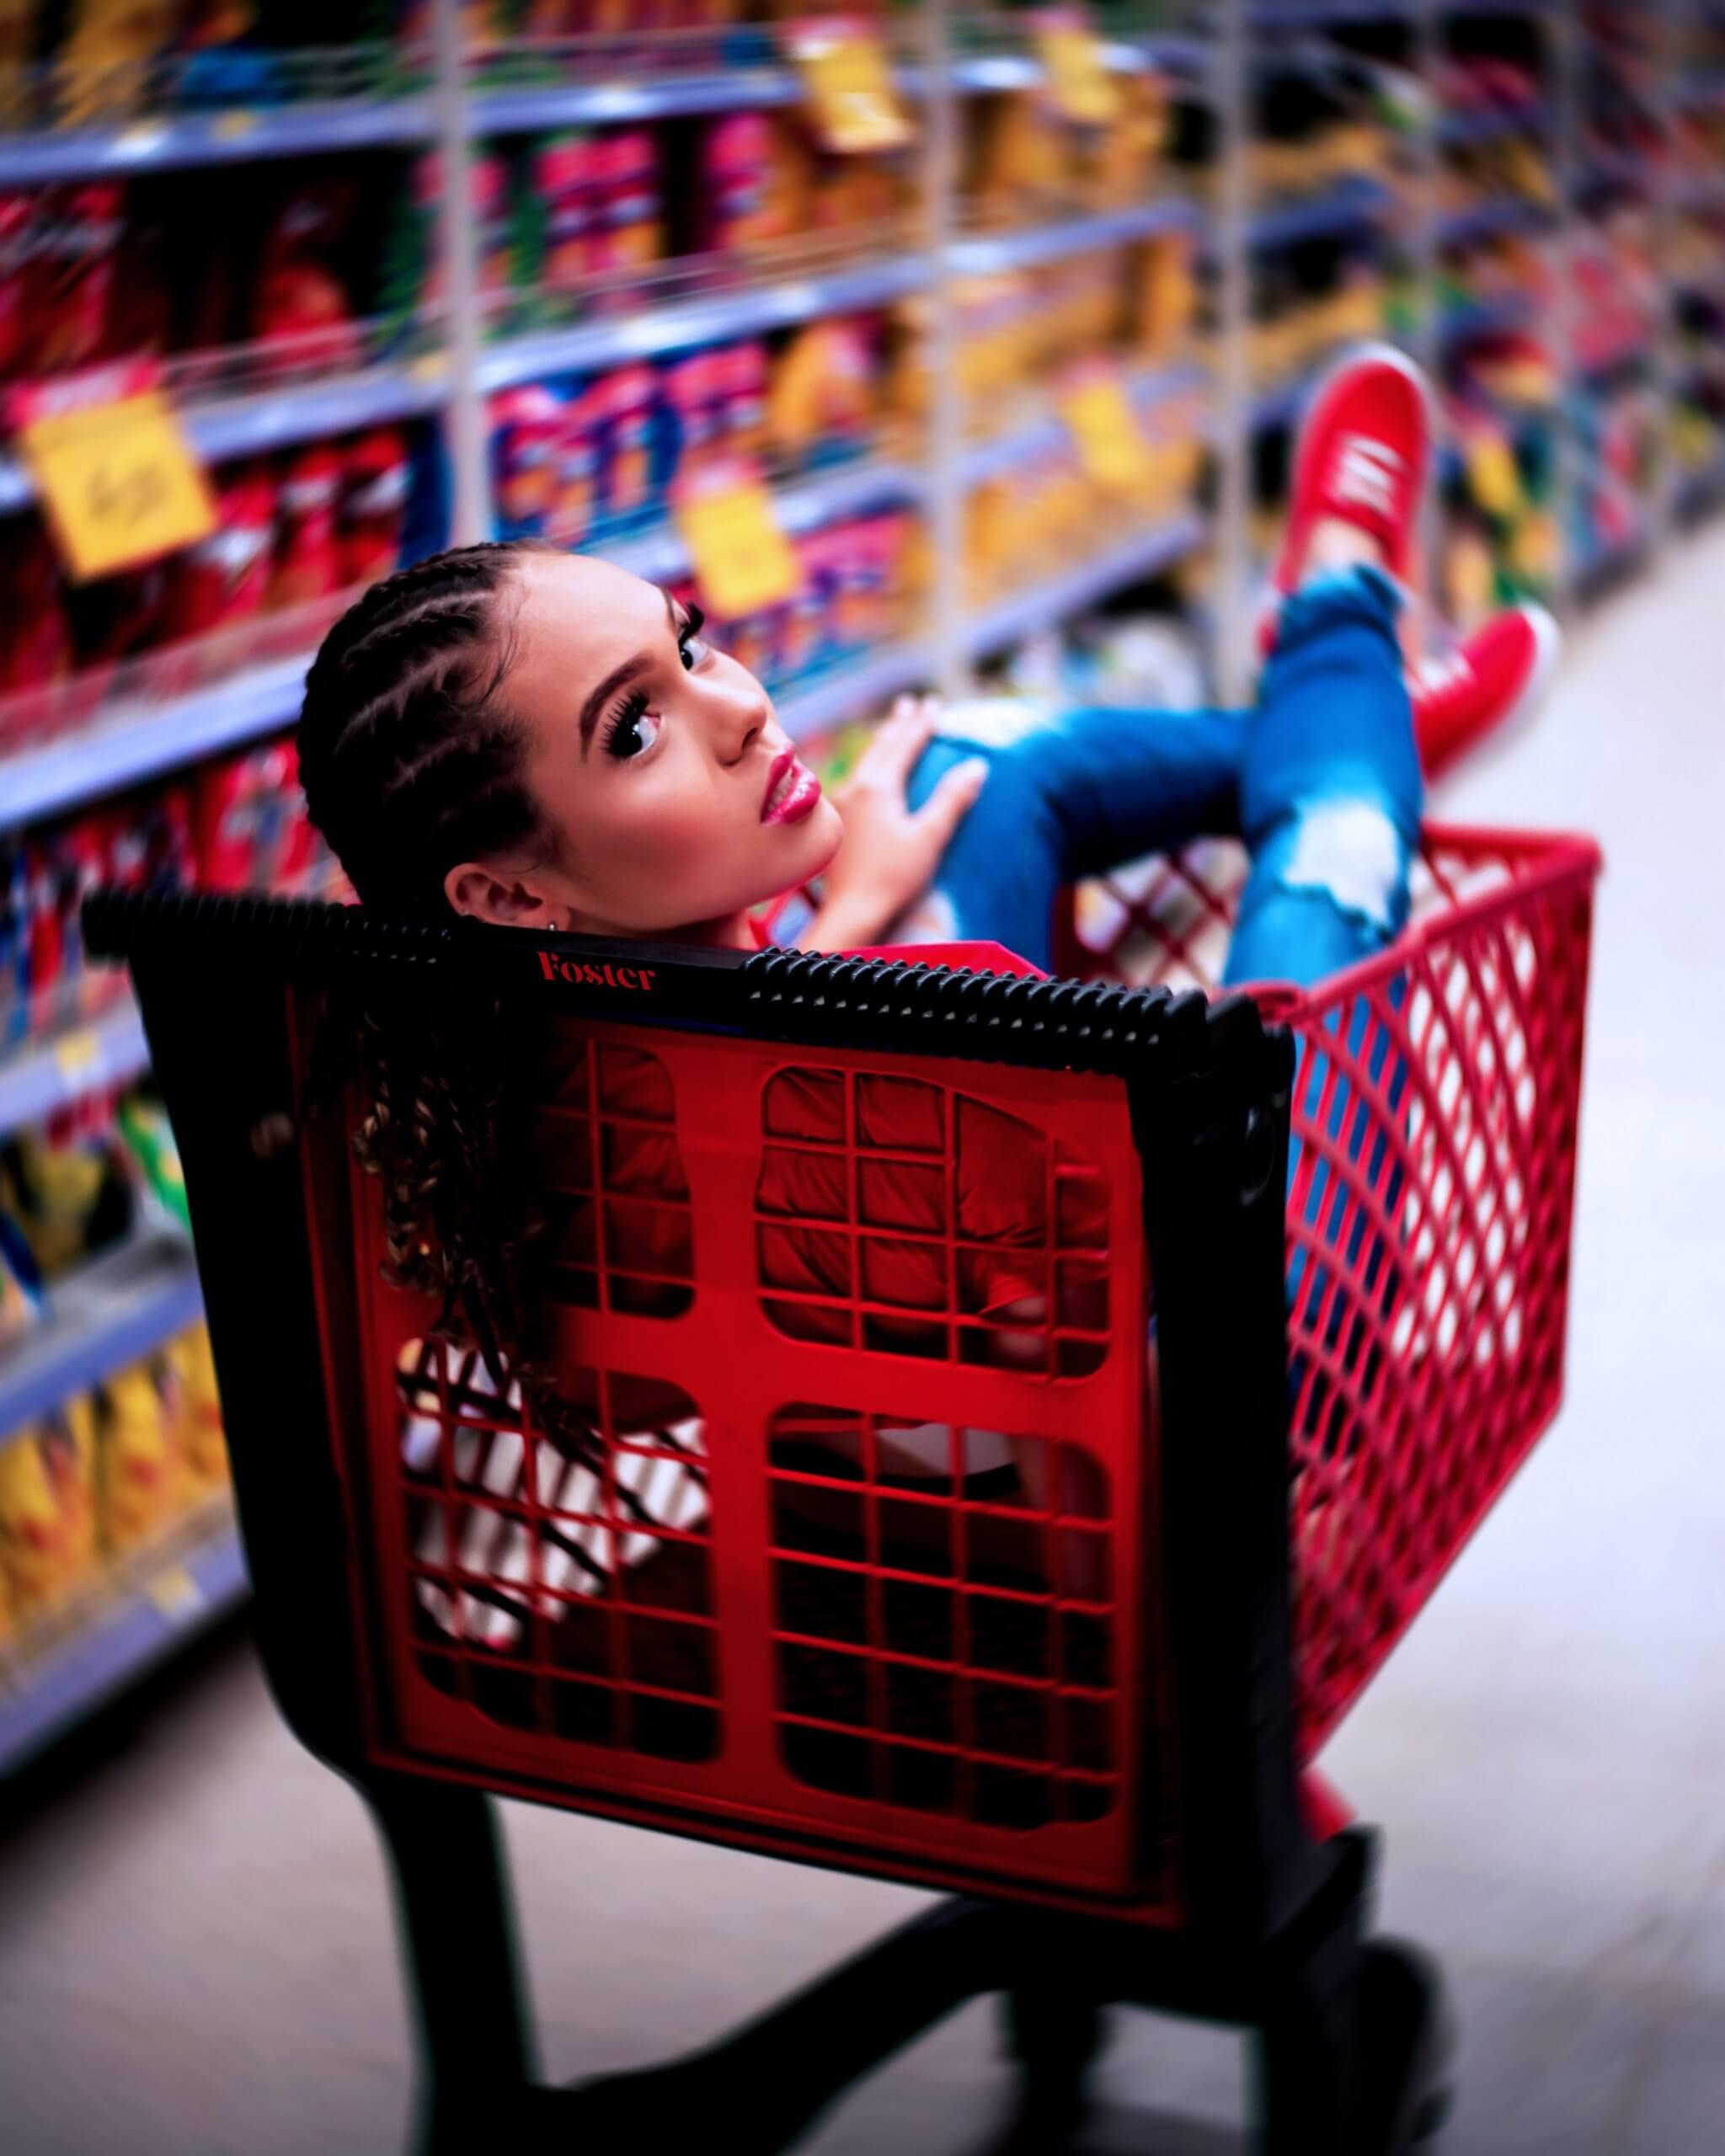 Female in Shopping Trolley